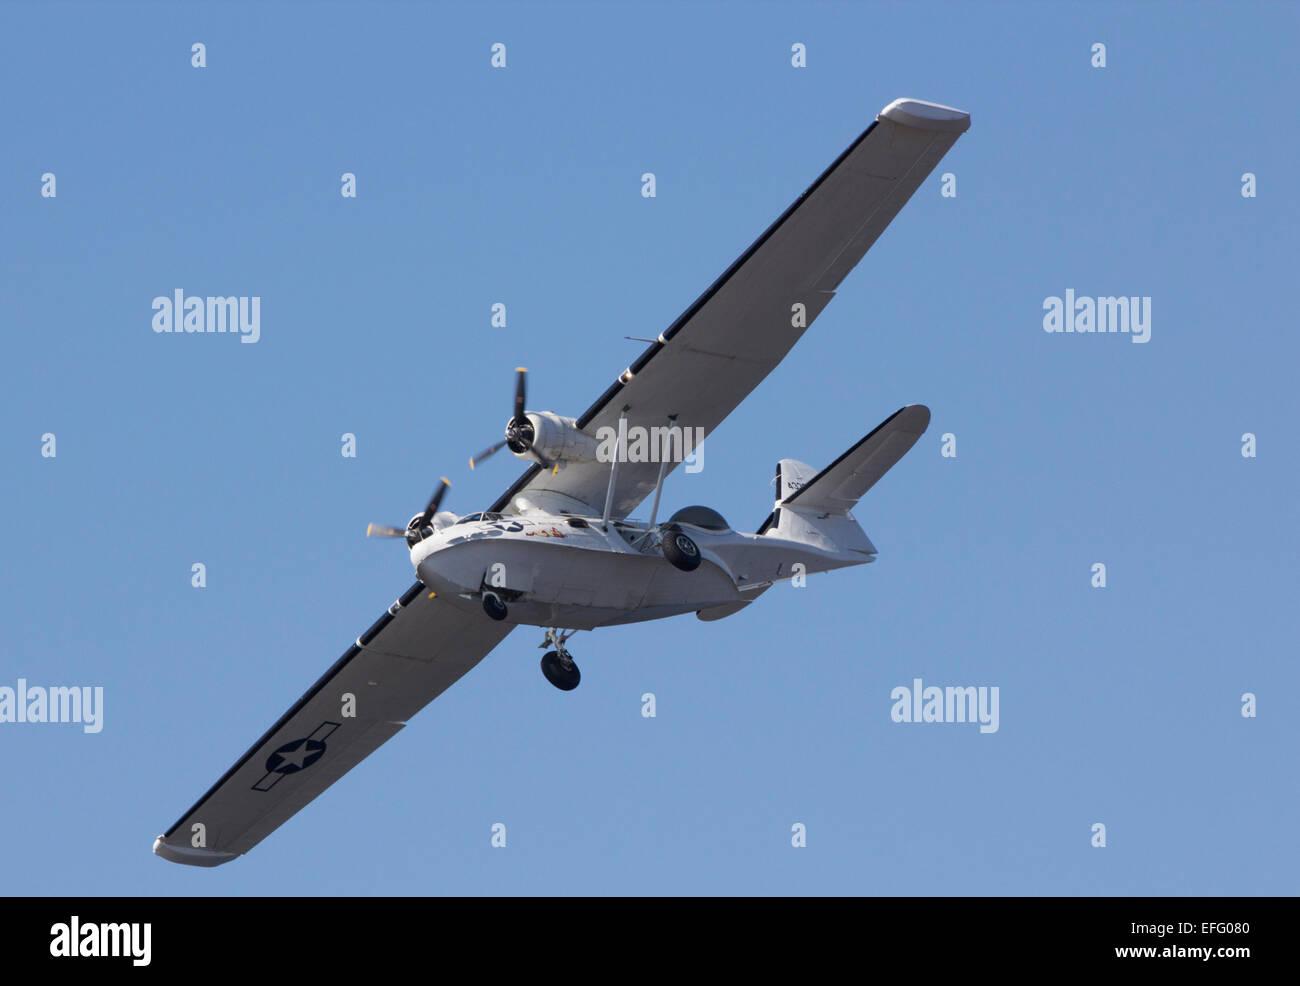 A World War 2 era Catalina flying boat in flight. It has its landing gear deployed - Stock Image